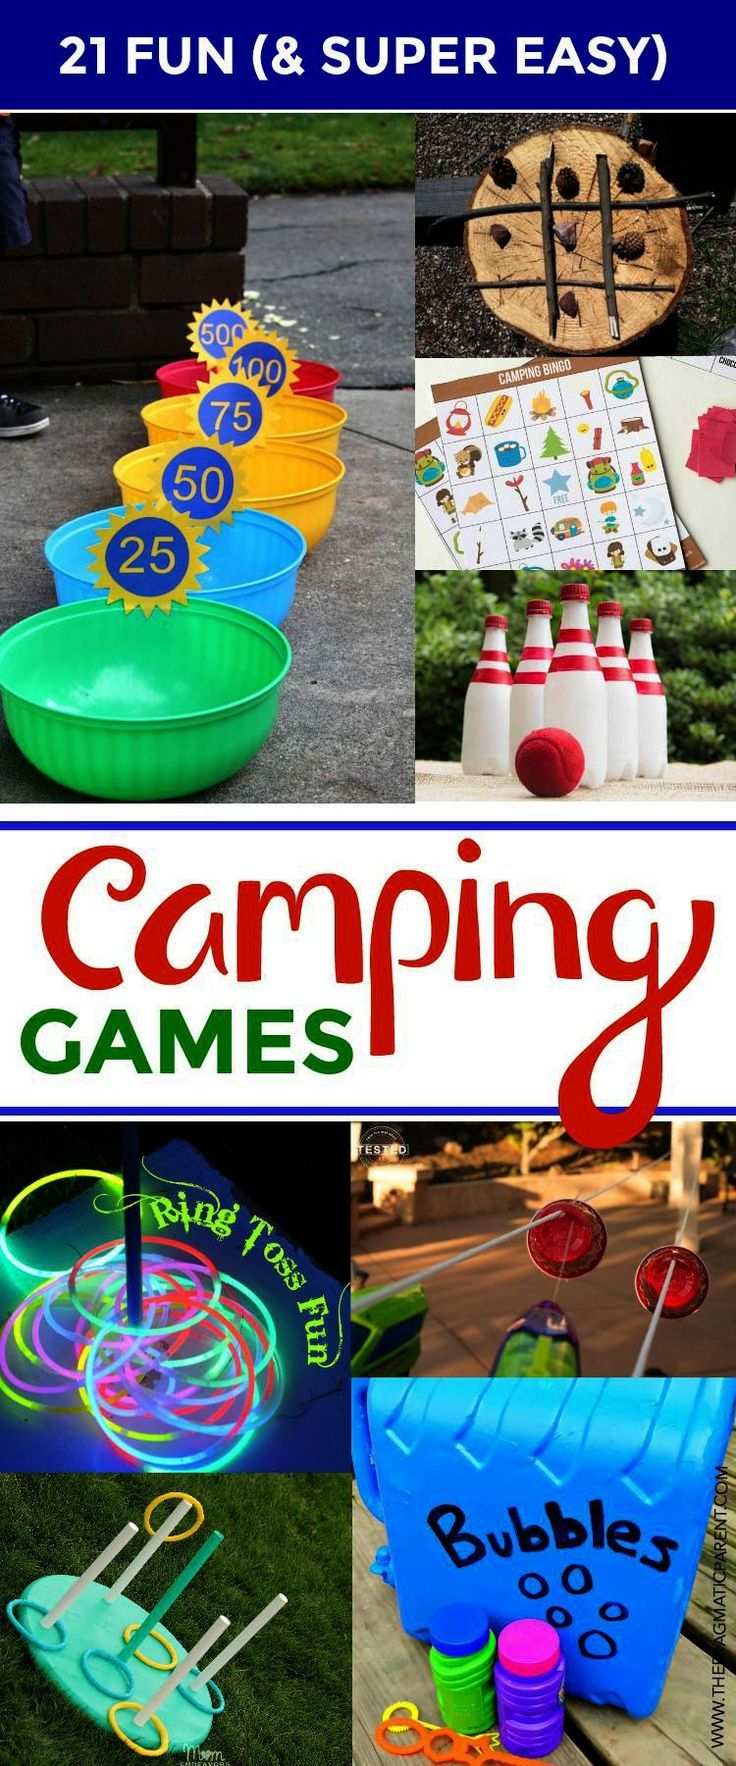 Camping Gear Dropshipping Only Camping In Florida State Parks Also Camping World Camping Dropshipping Kamp Oyunlari Yaz Aktiviteleri Cocuk Aktiviteleri